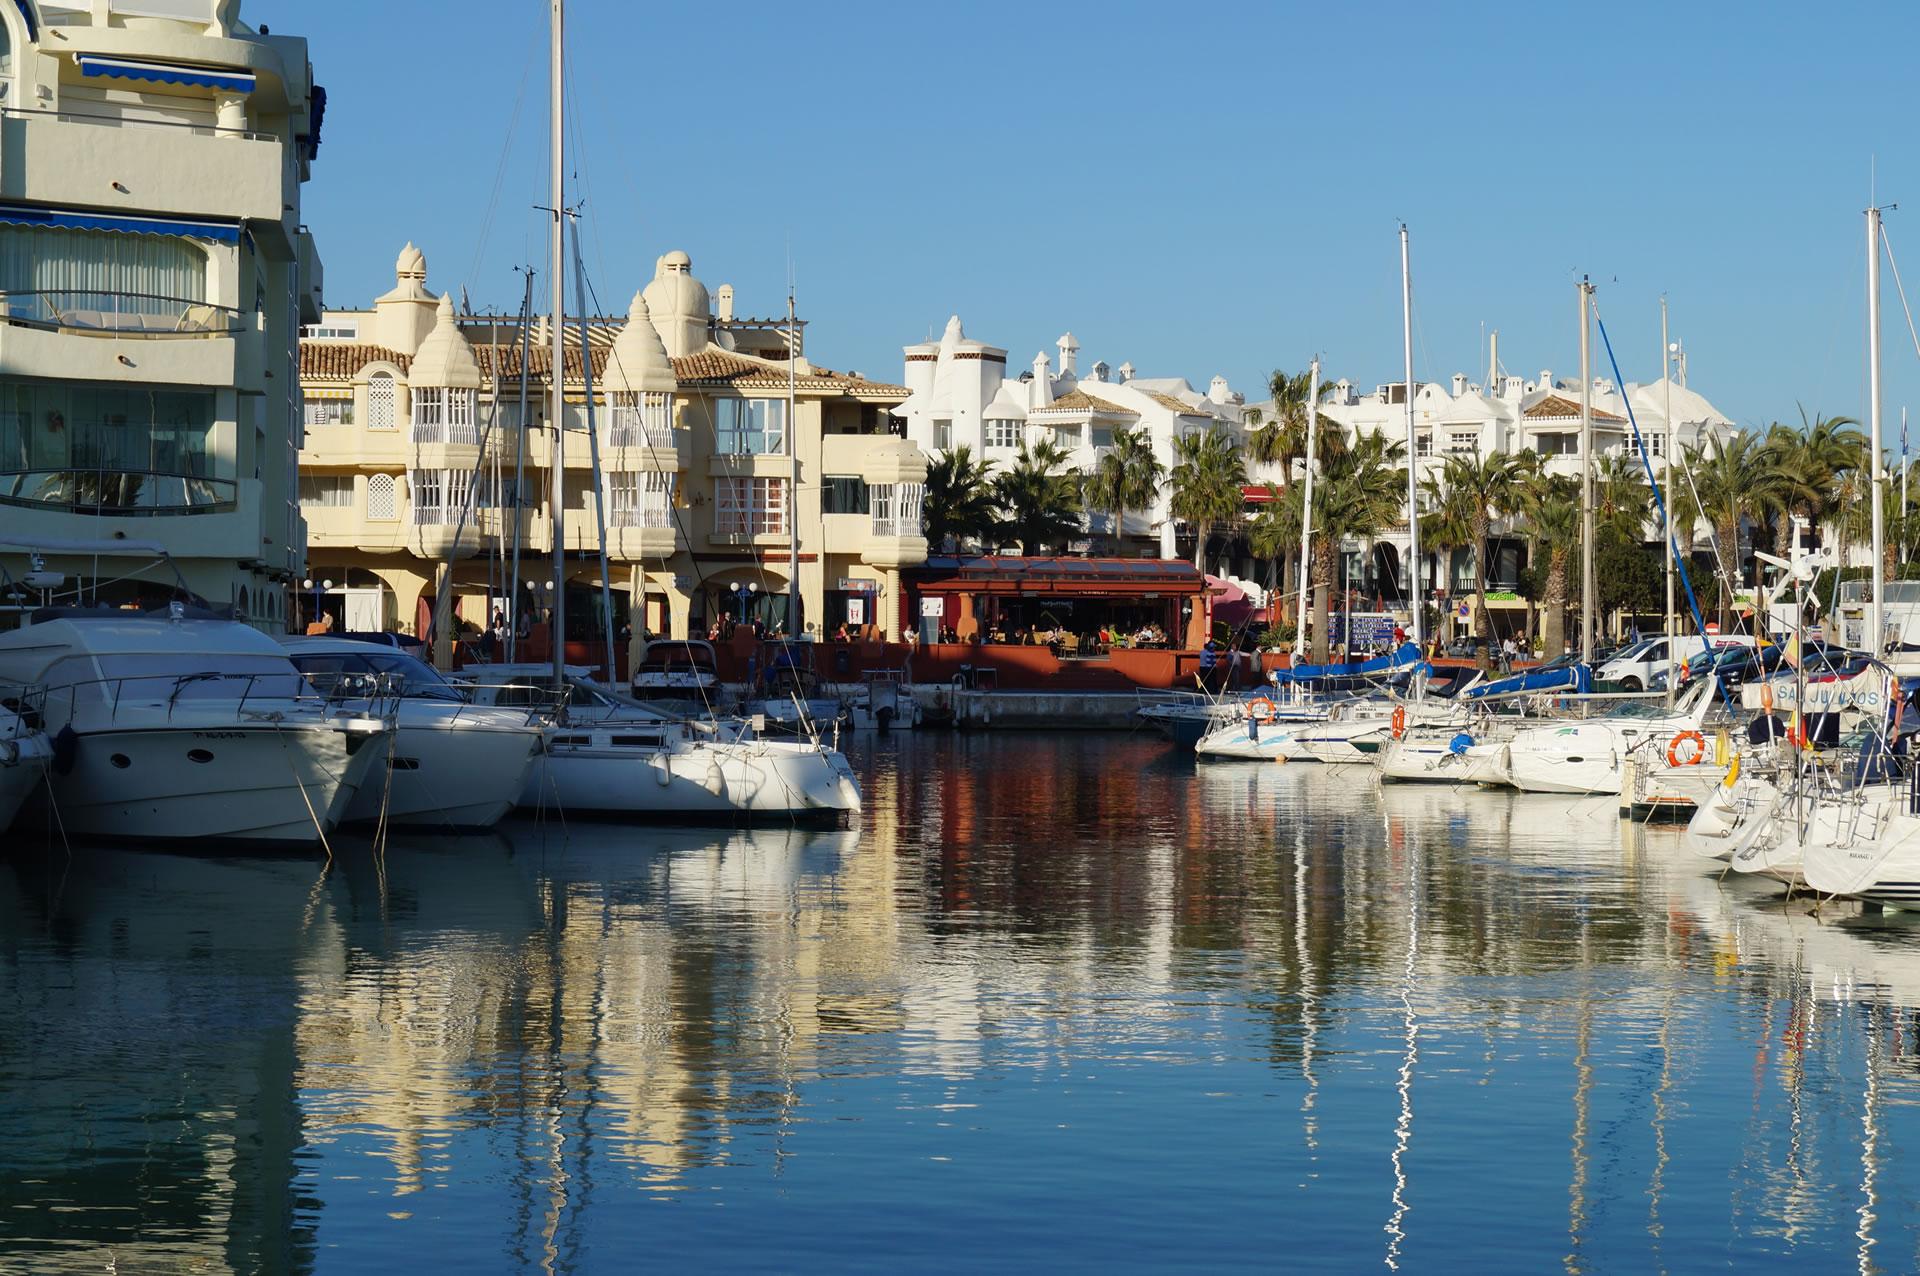 Puerto Marina - Puerto Deportivo de Benalmádena